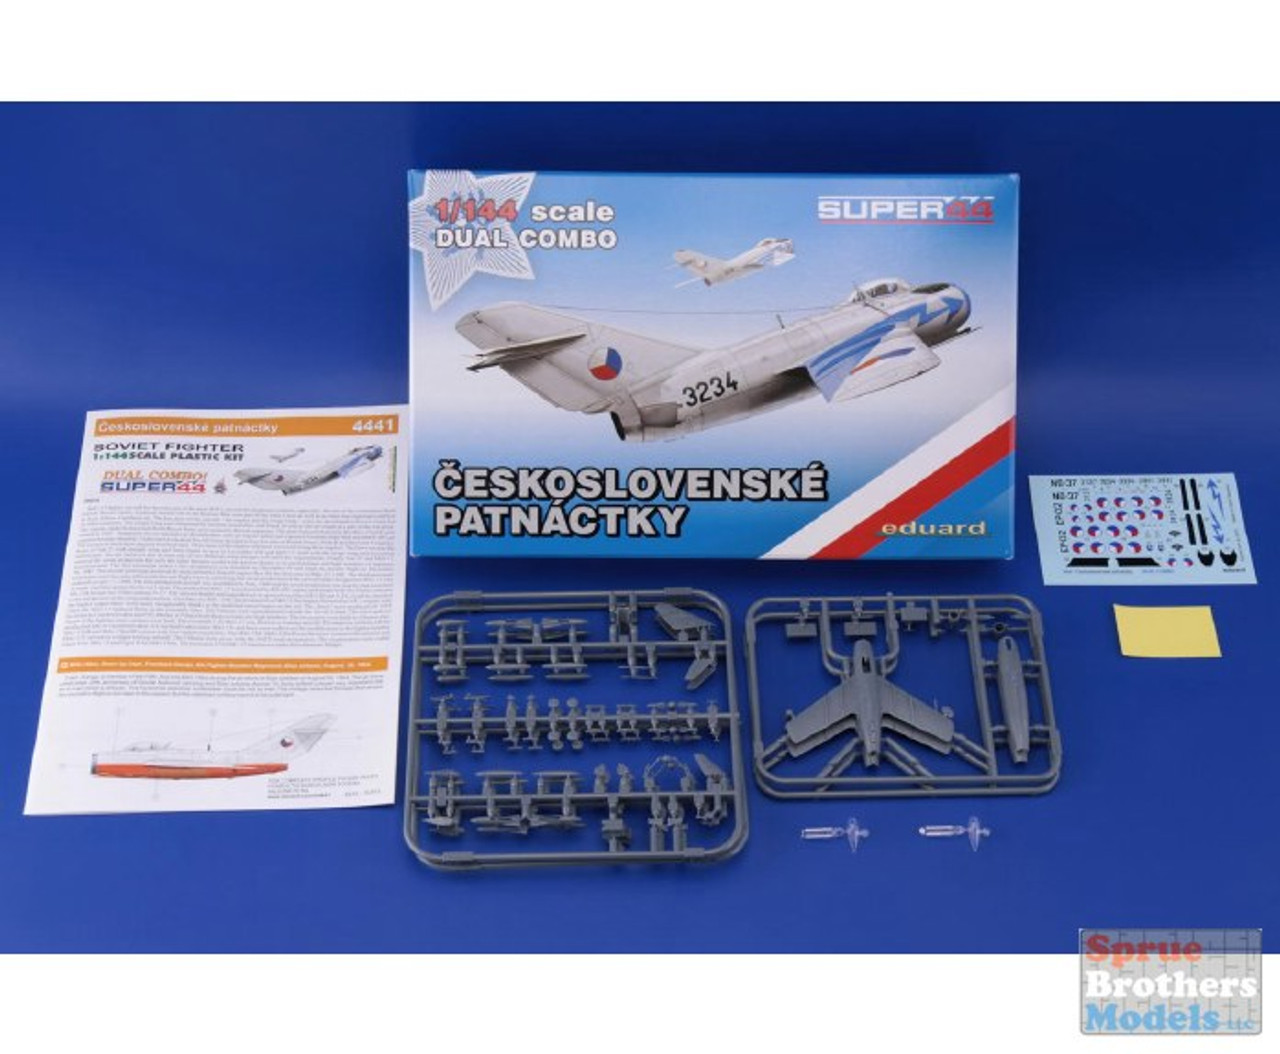 EDU04441 1:144 Eduard MiG-15 Fagot Ceskoslovenske Patnactky DUAL COMBO